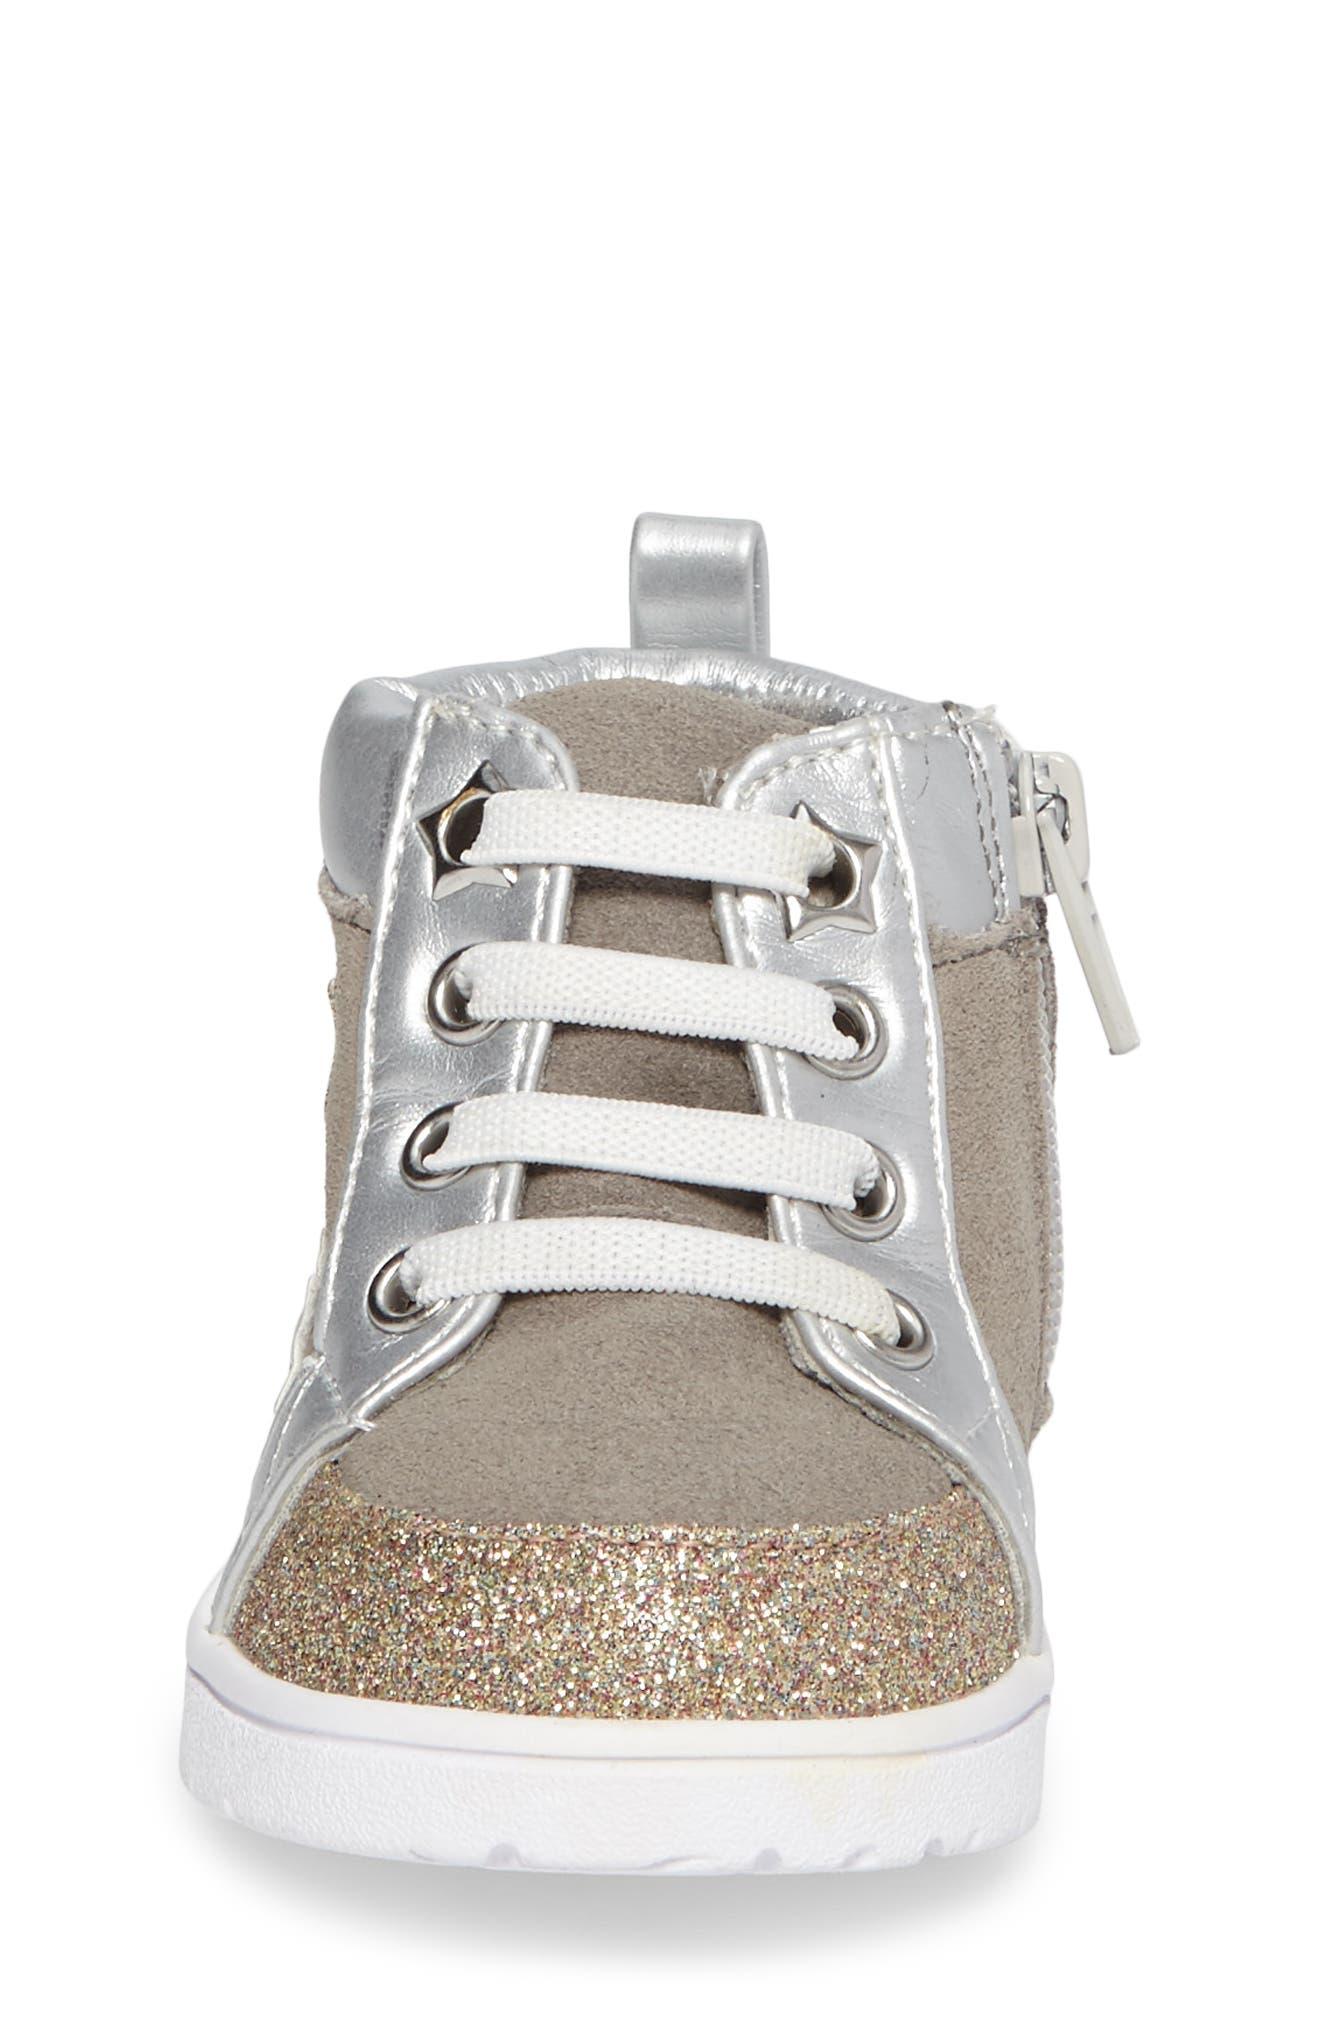 Diantha Star Appliqué High Top Sneaker,                             Alternate thumbnail 4, color,                             020